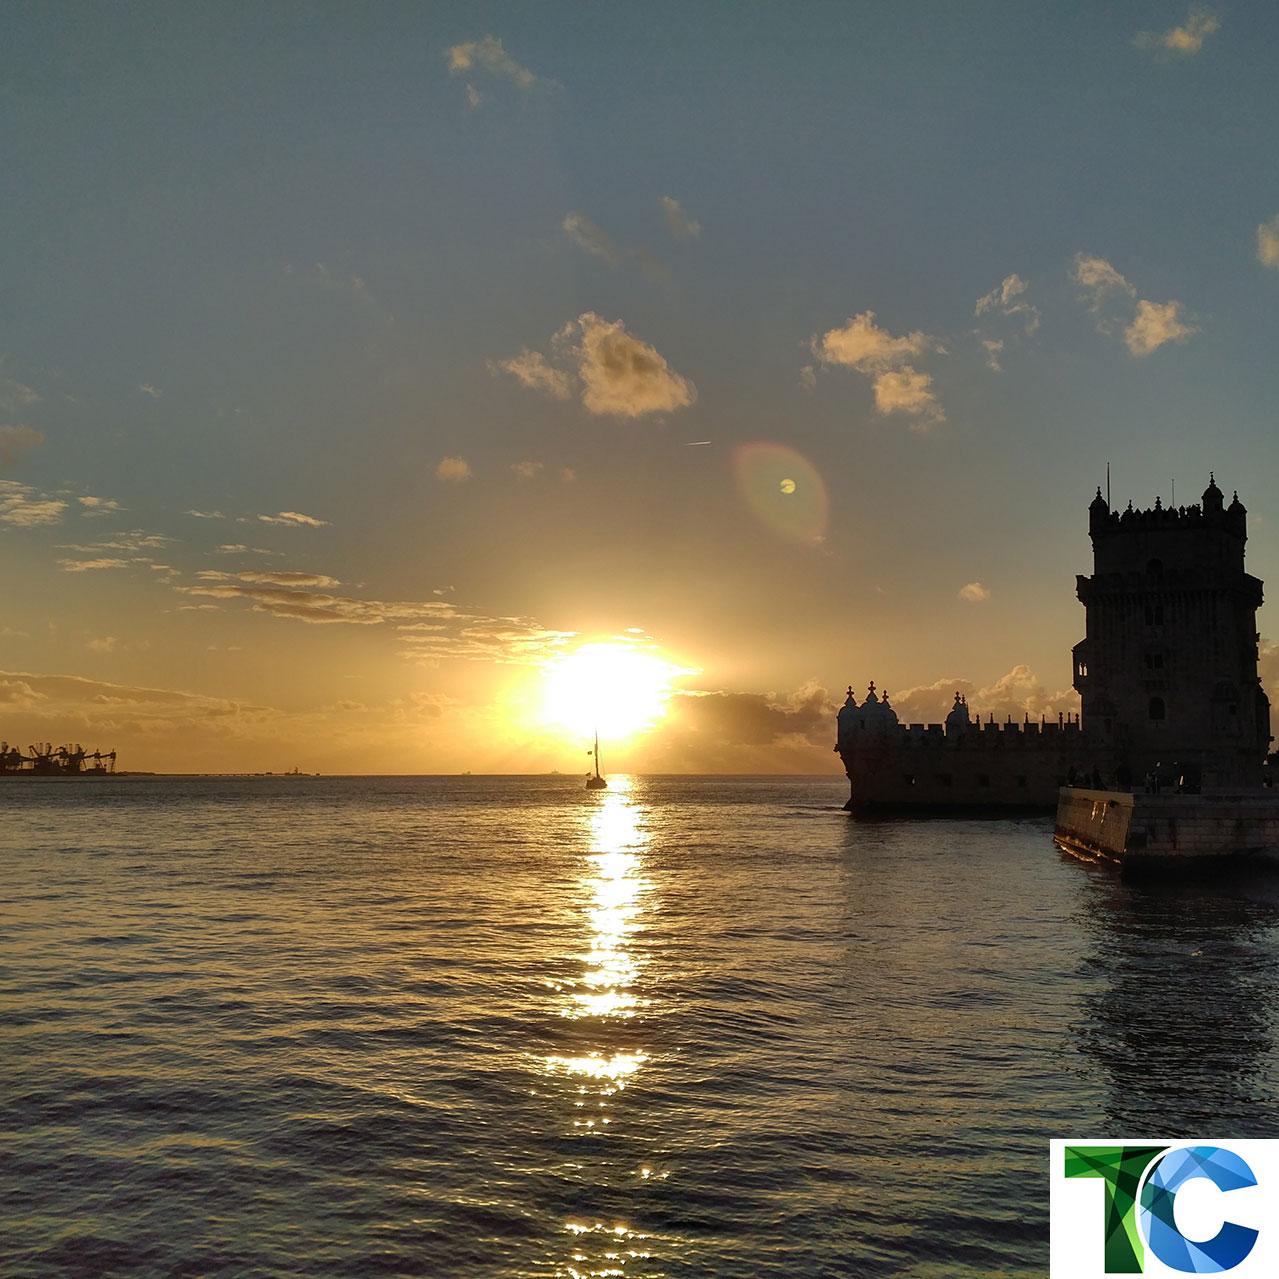 Sonnenuntergang im Lissabonner Stadtteil Belém an der Tejomündung. (Copyright: Thorsten Claus)